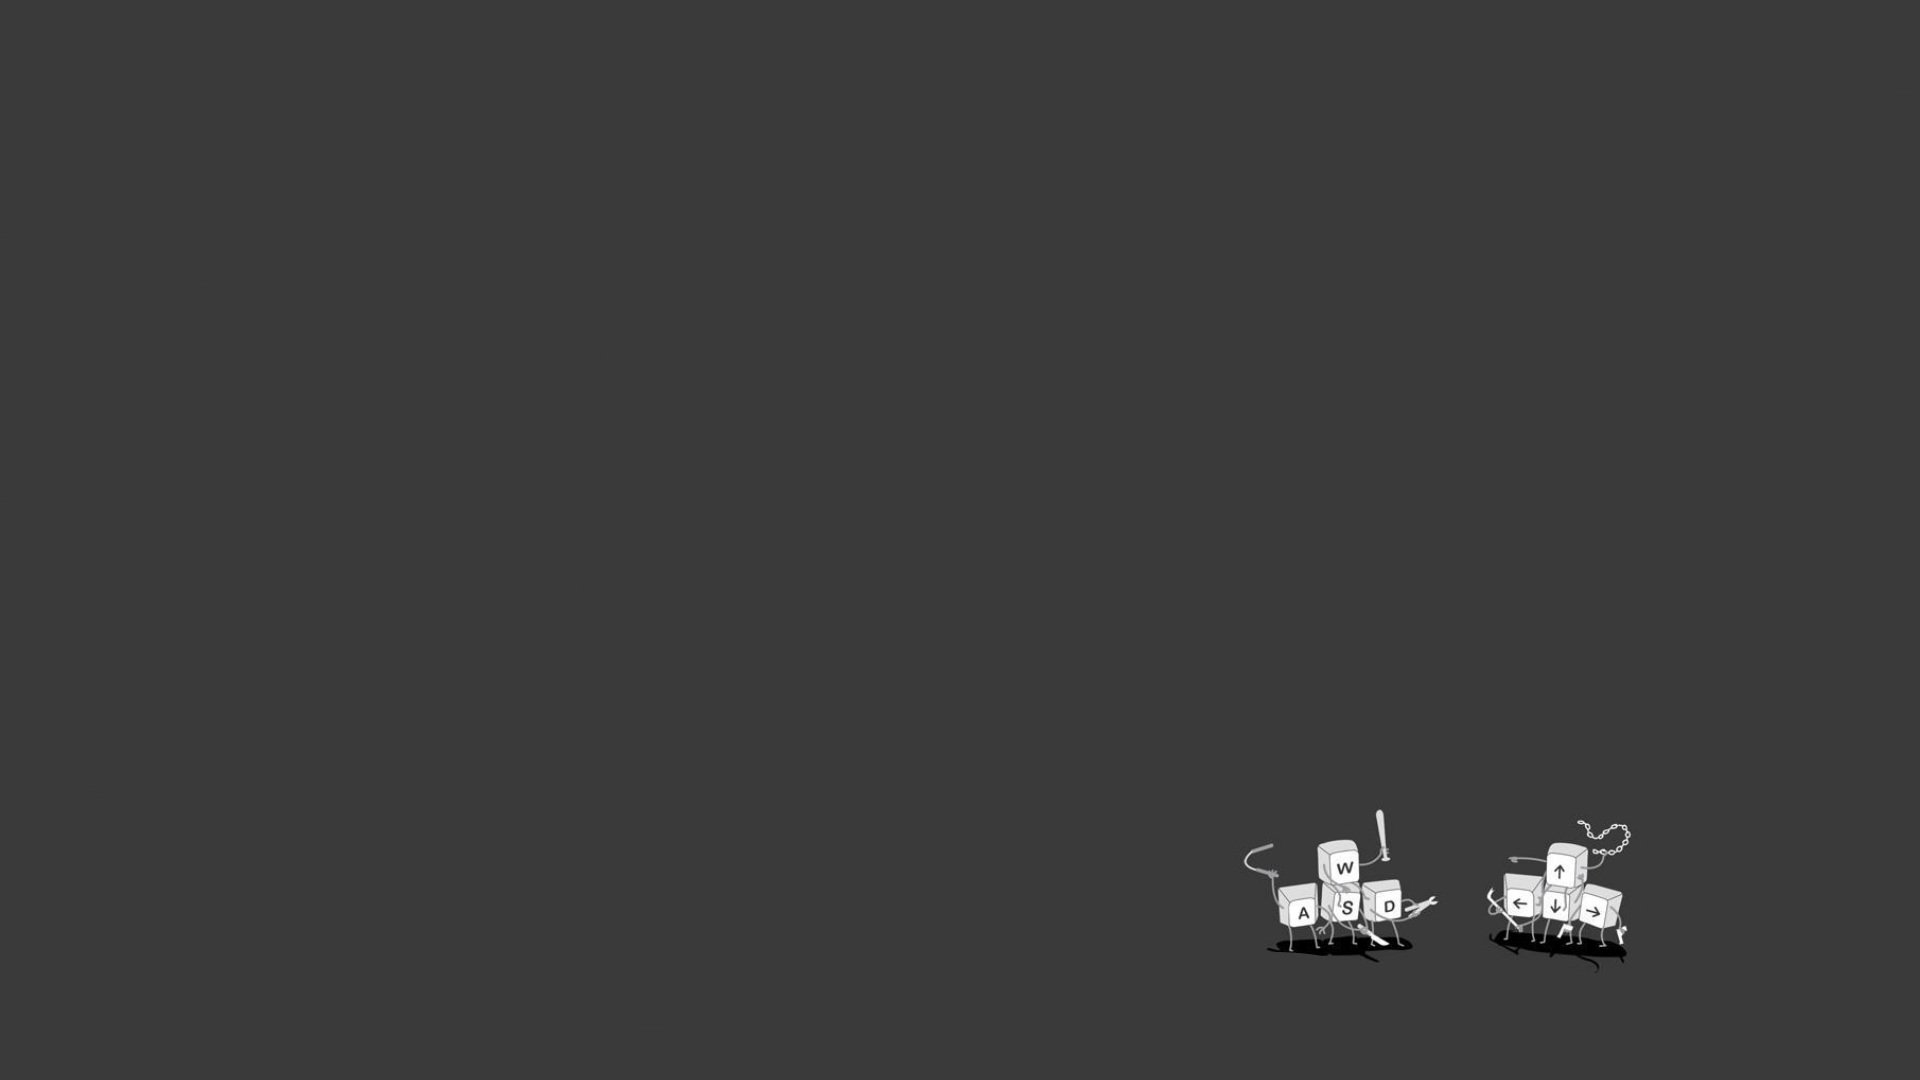 minimalistic computers funny simplistic simple wallpaper background 1920x1080